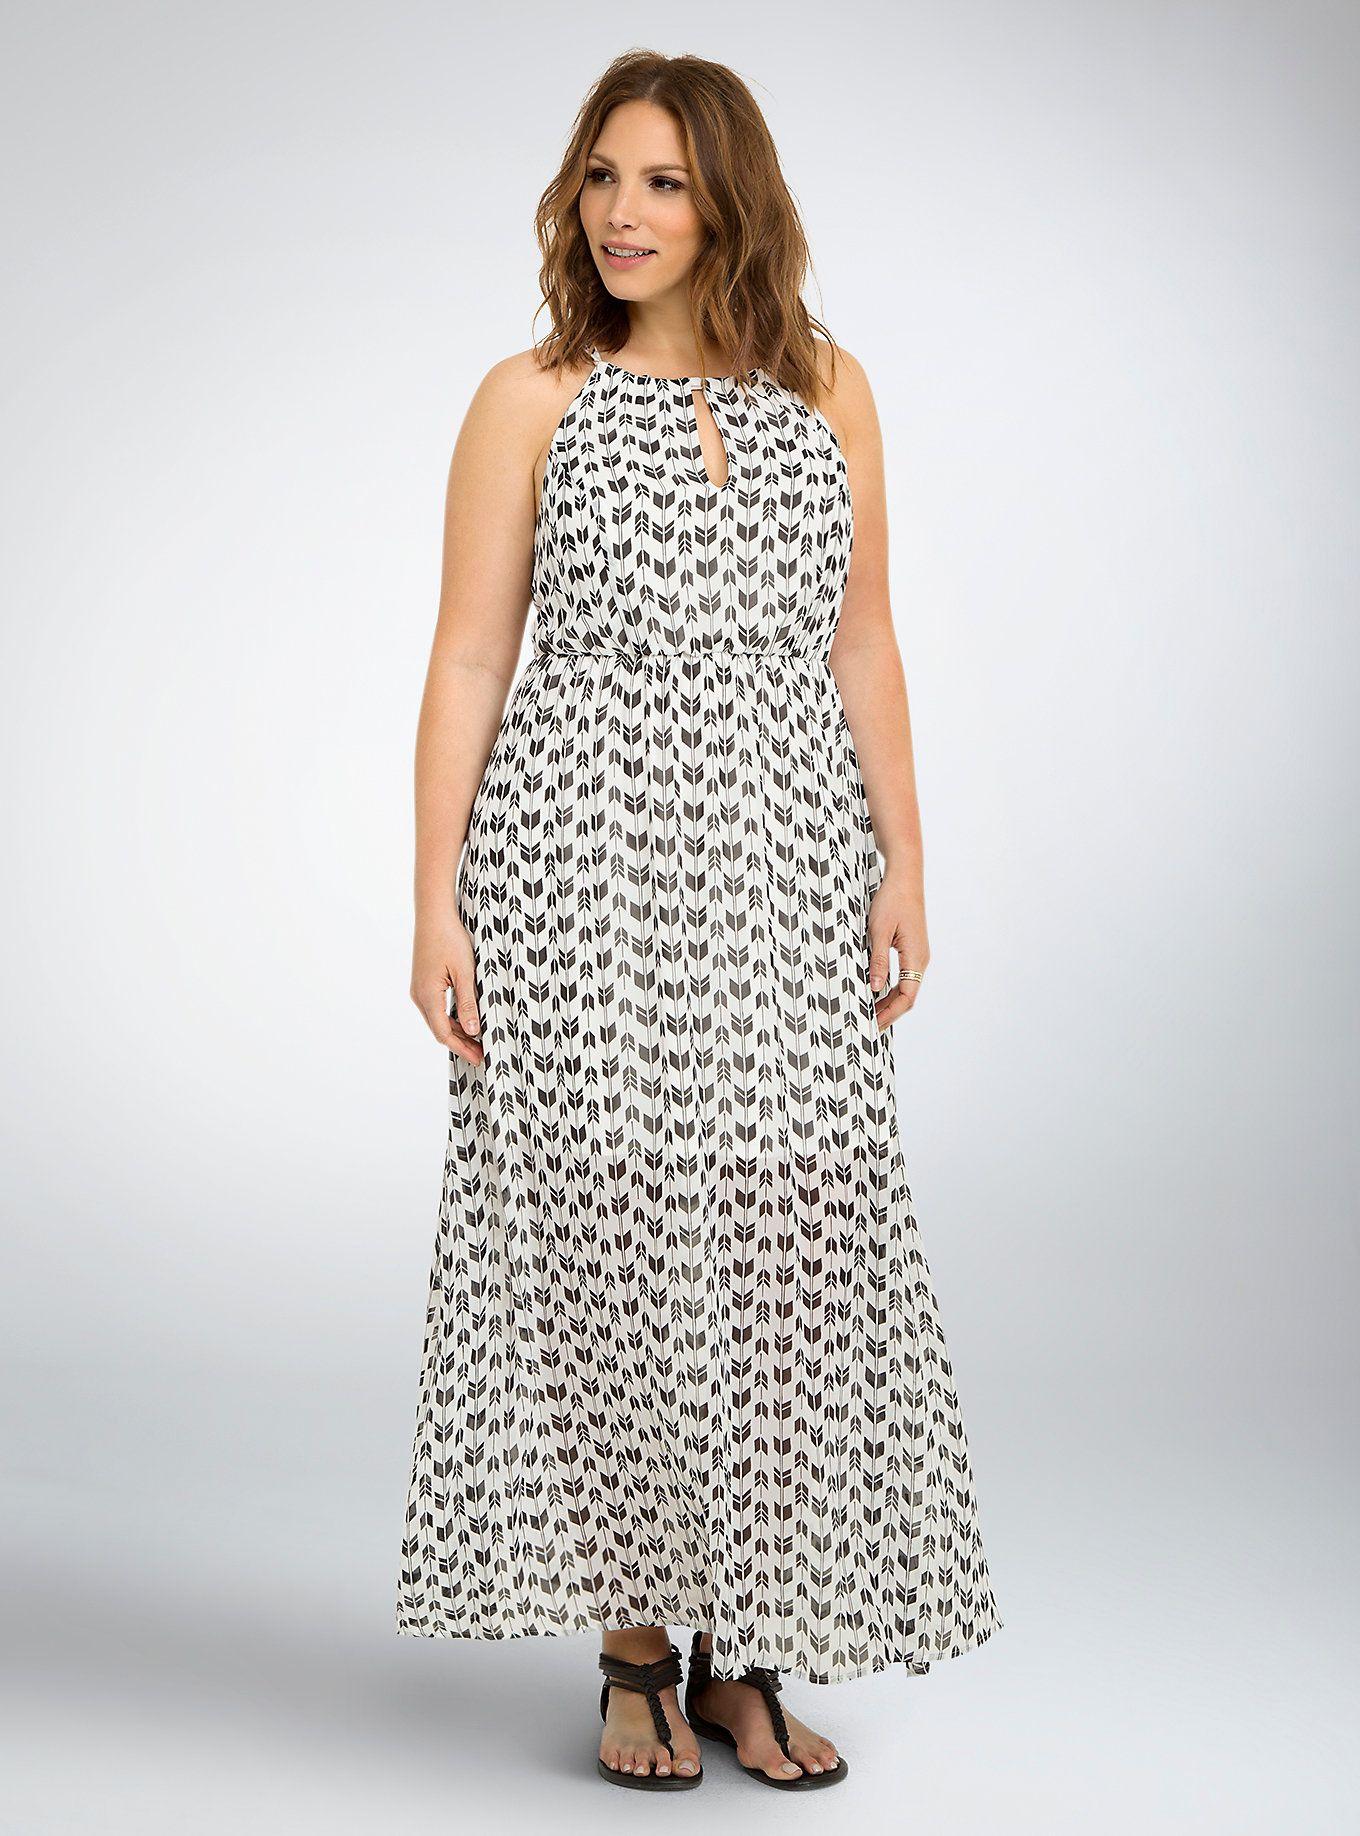 Lace dress torrid  Arrow Print Halter Maxi Dress  Halter maxi dresses Torrid and Maxi